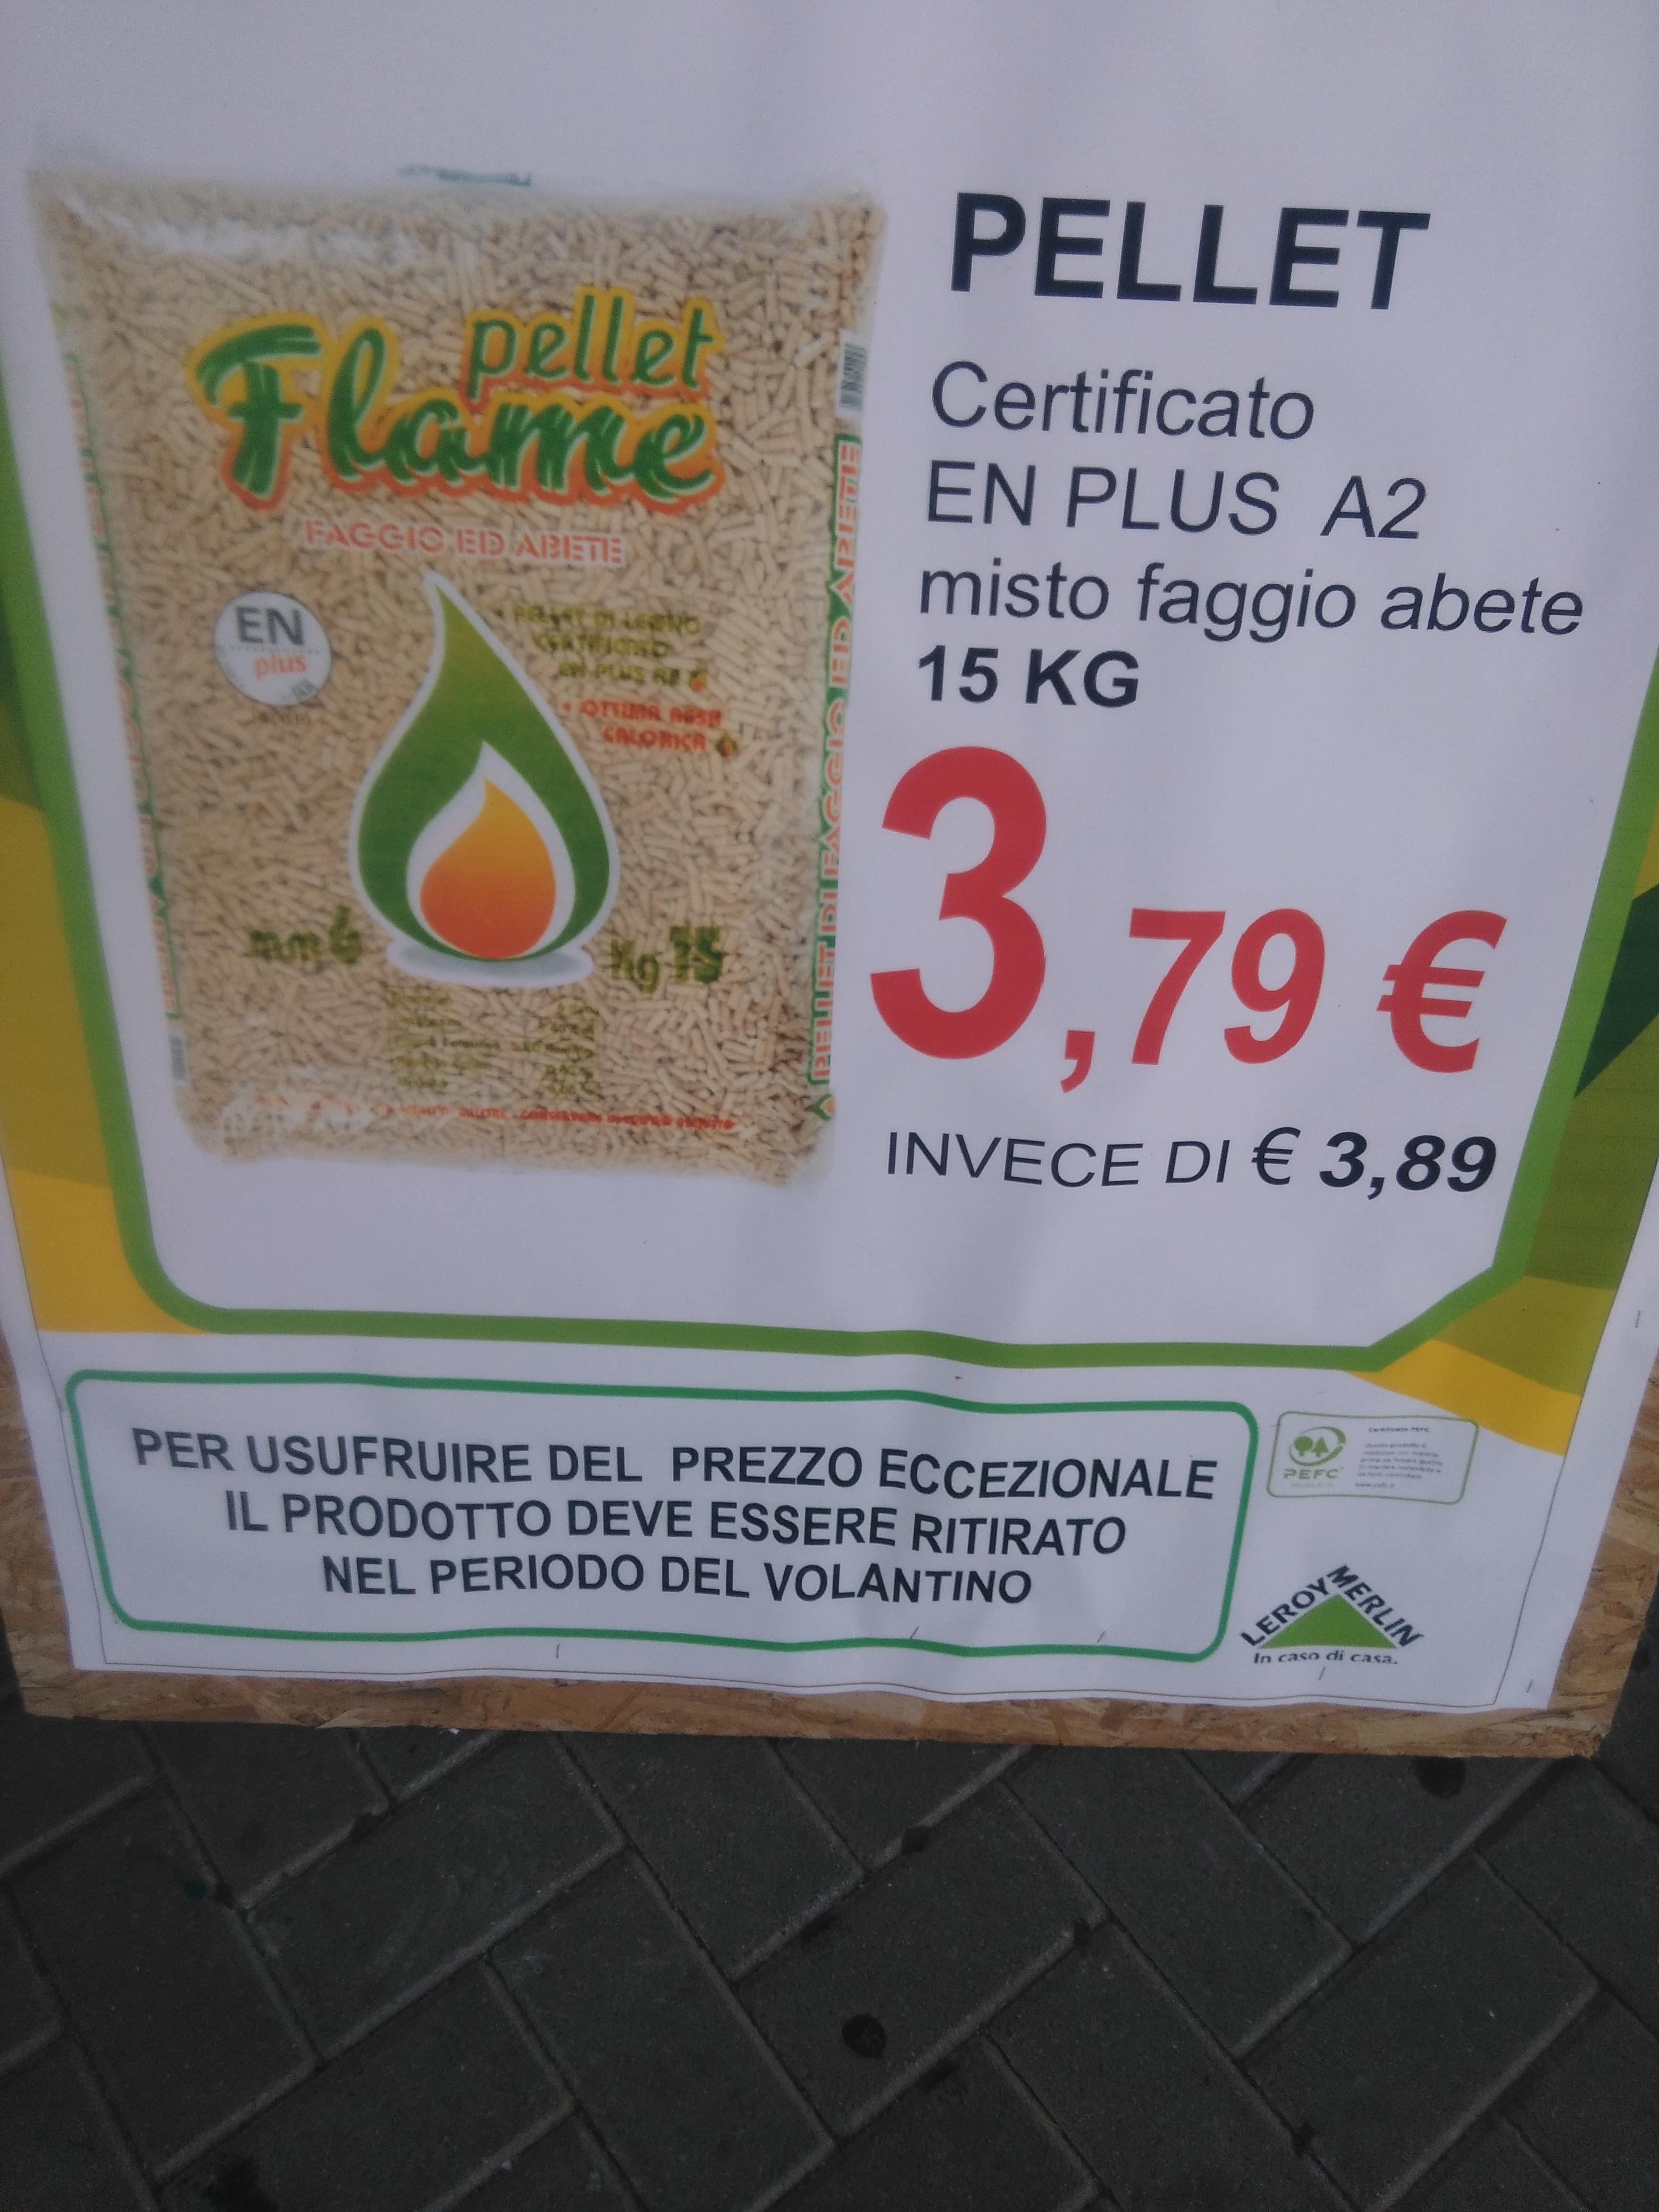 Stufa pellet leroy merlin beautiful caldeira a pellets for Pellets leroy merlin